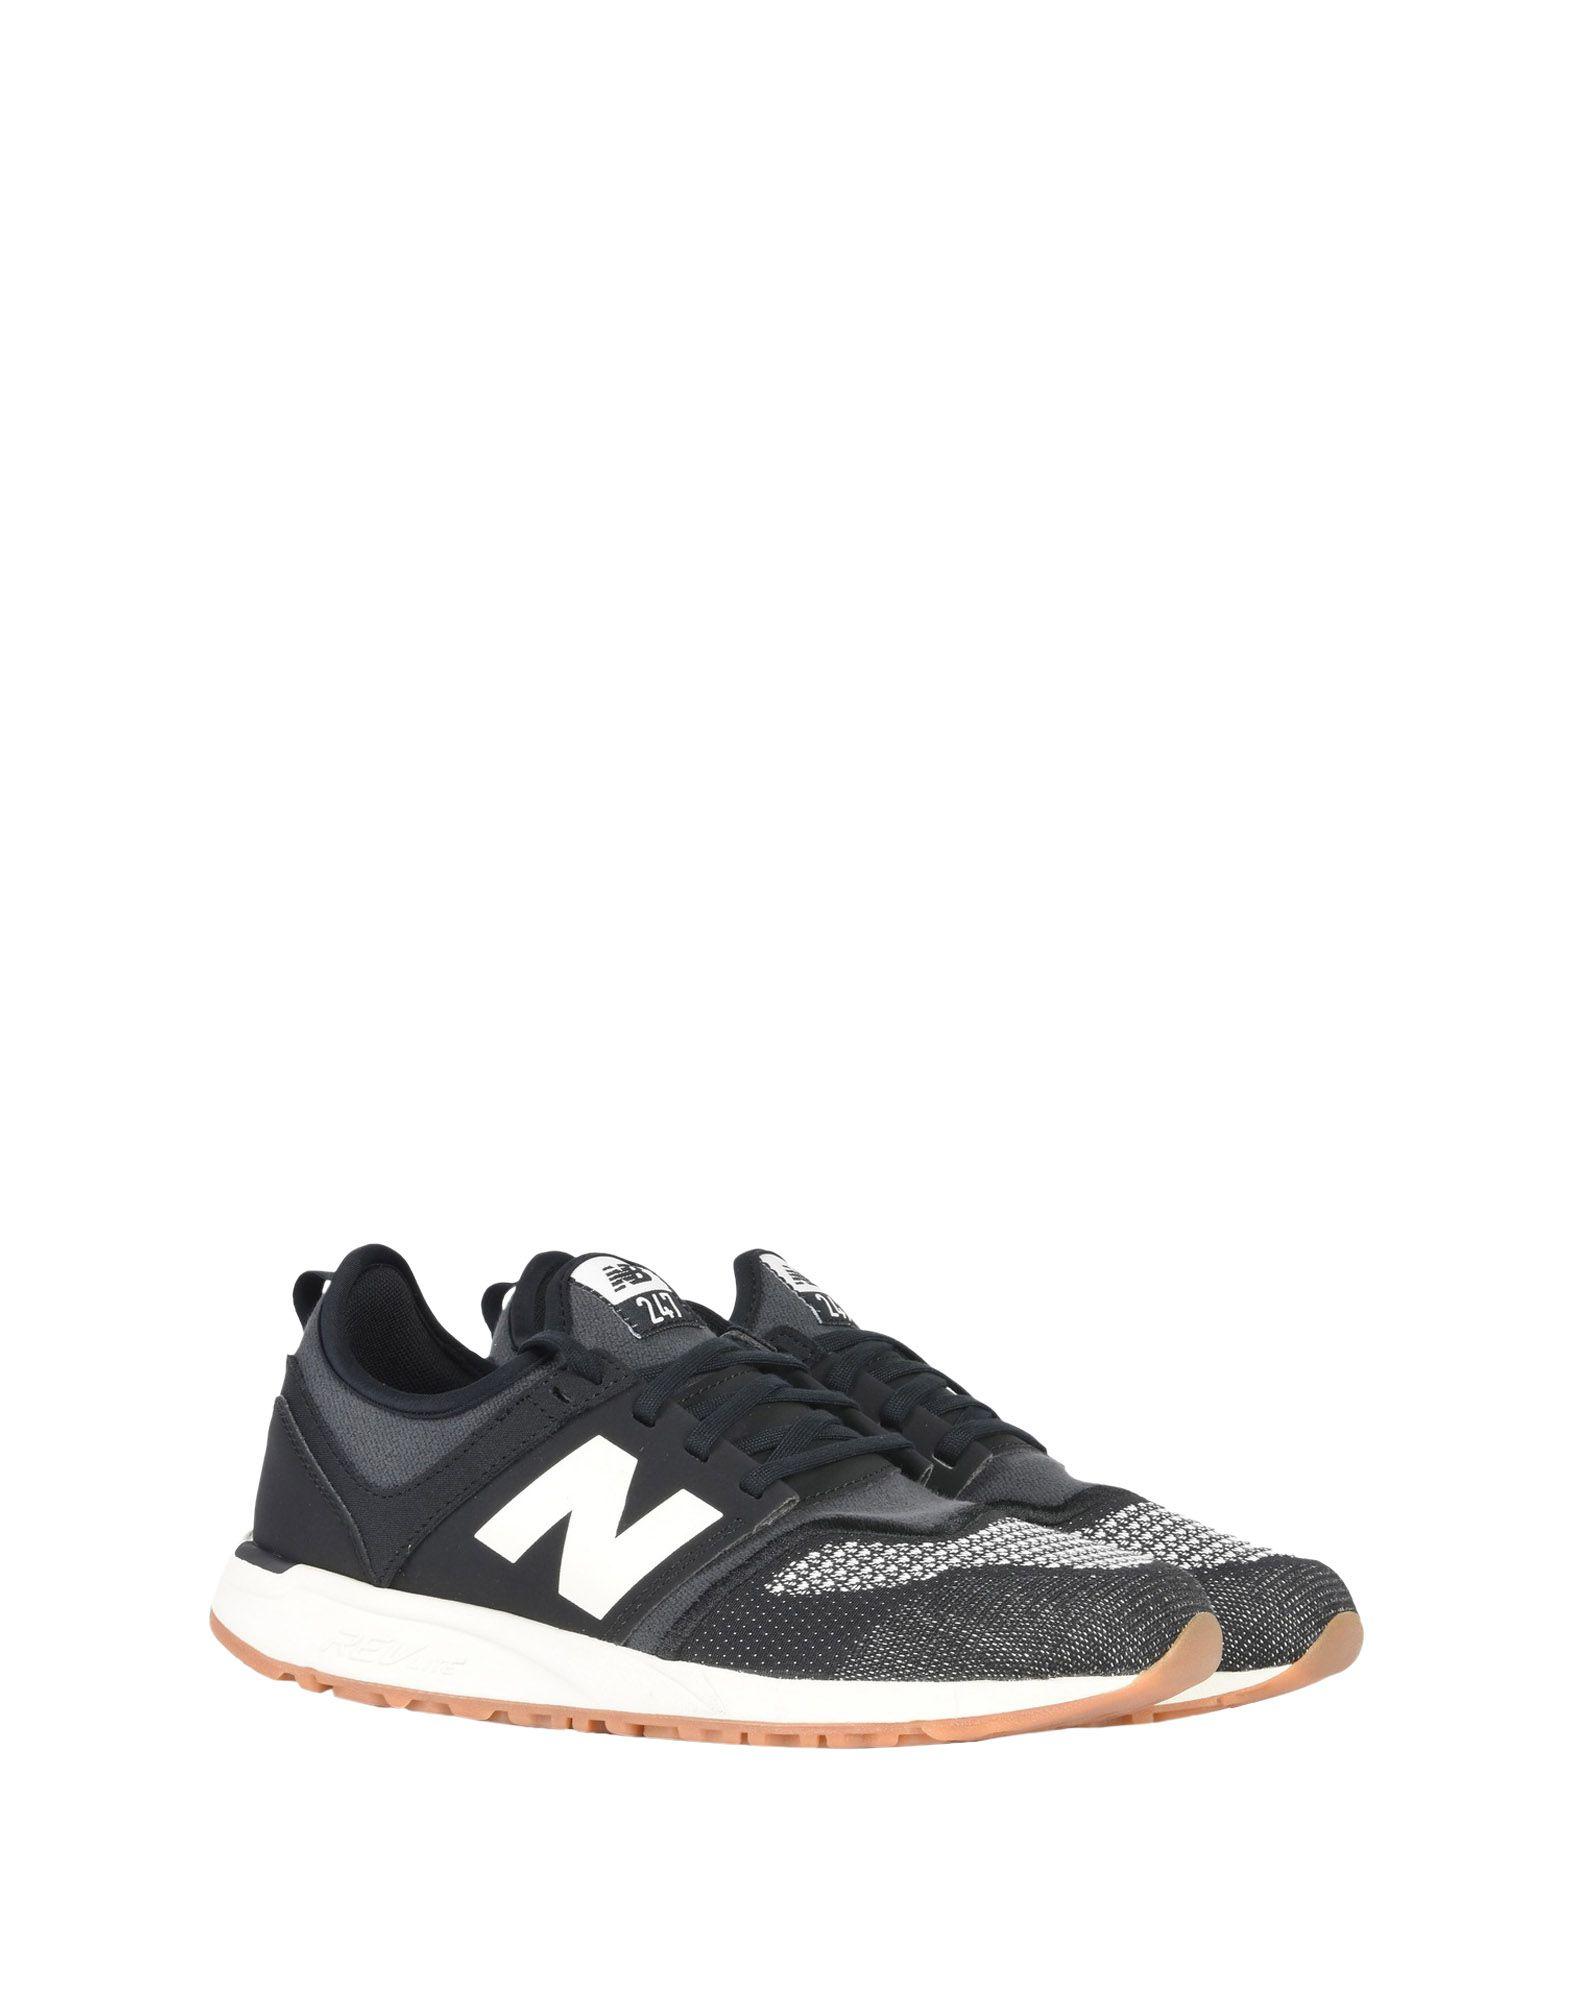 Sneakers New Balance 247 Engineered Cotton - Donna - 11489416TT